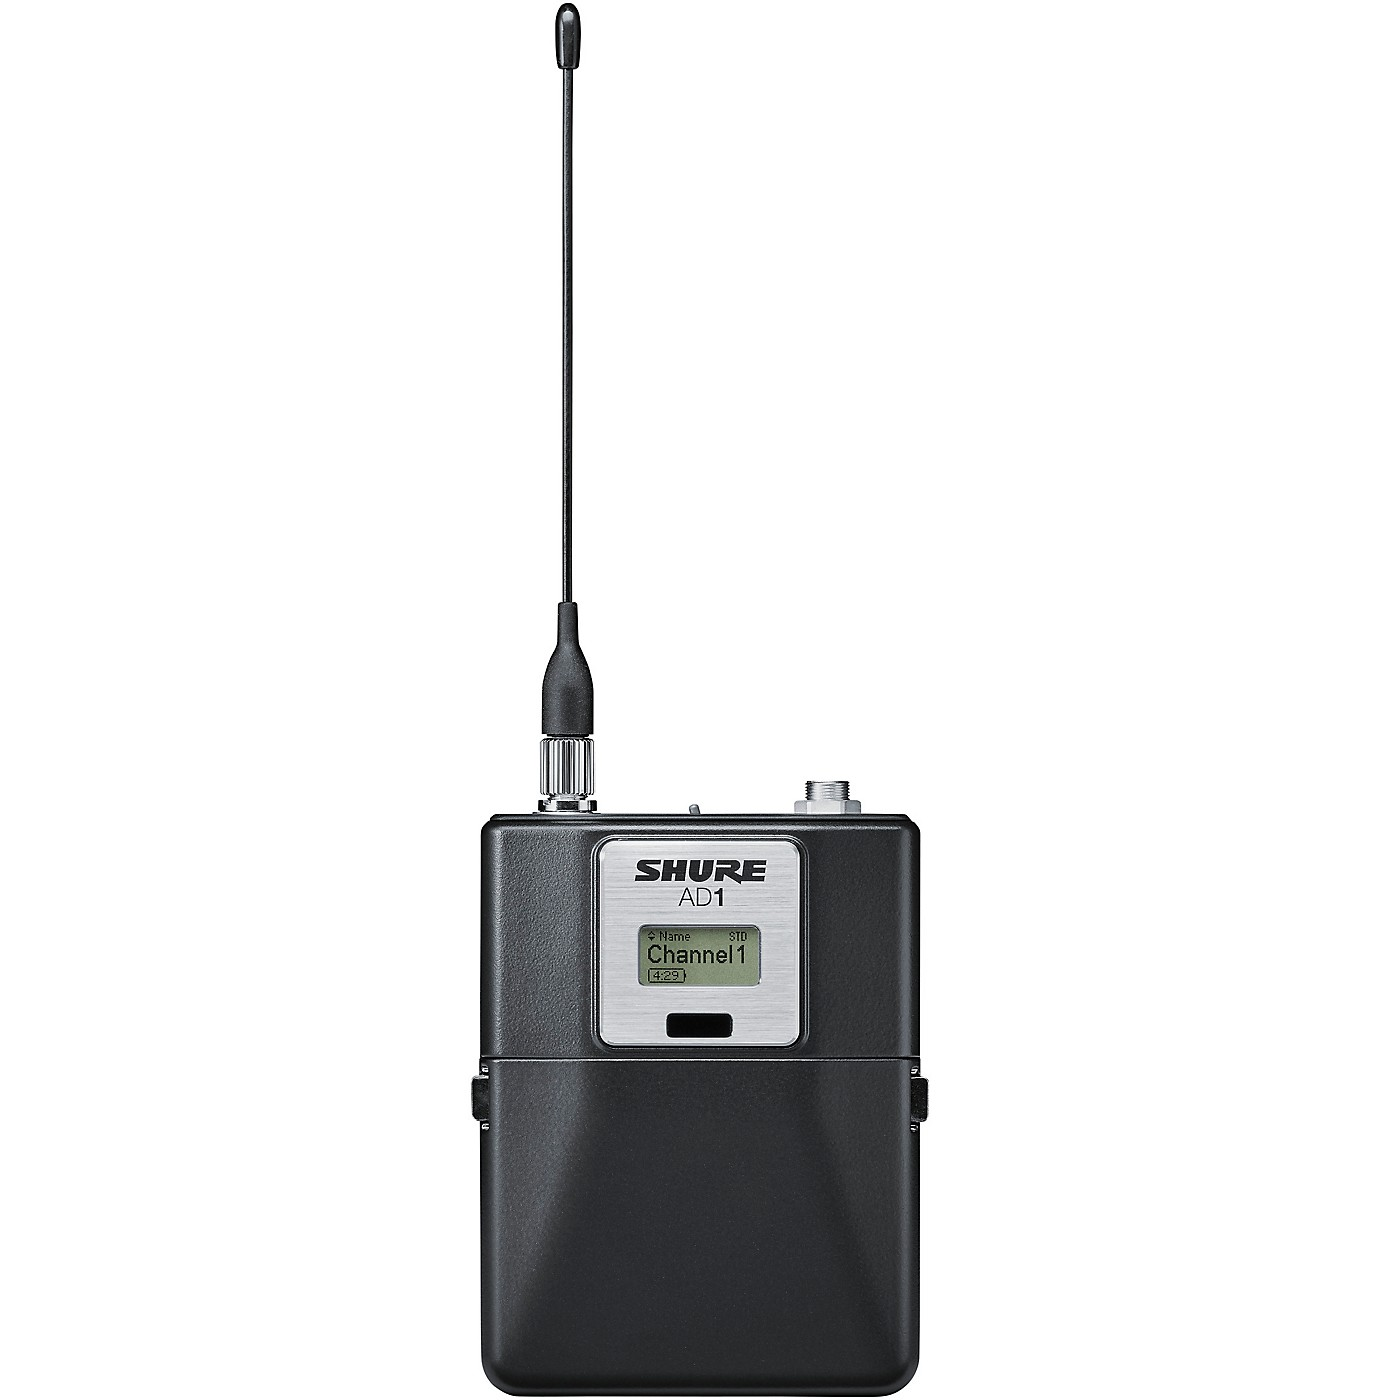 Shure Axient Digital AD1LEMO3 Wireless BodypackTransmitter, LEMO3 Connector thumbnail